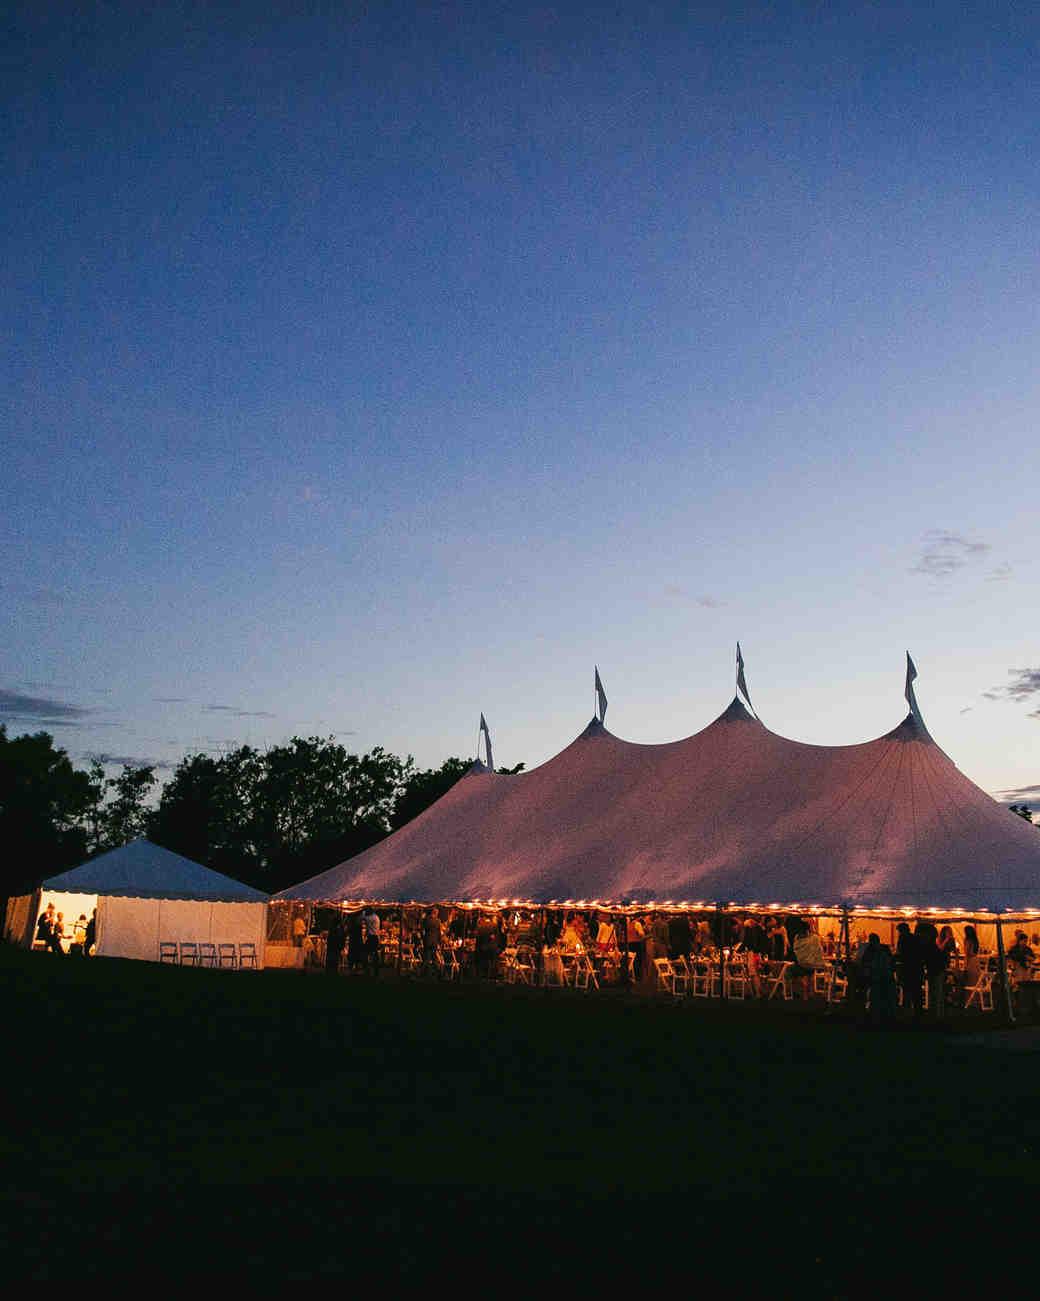 gabriela-tyson-wedding-tent-1105-s111708-1214.jpg